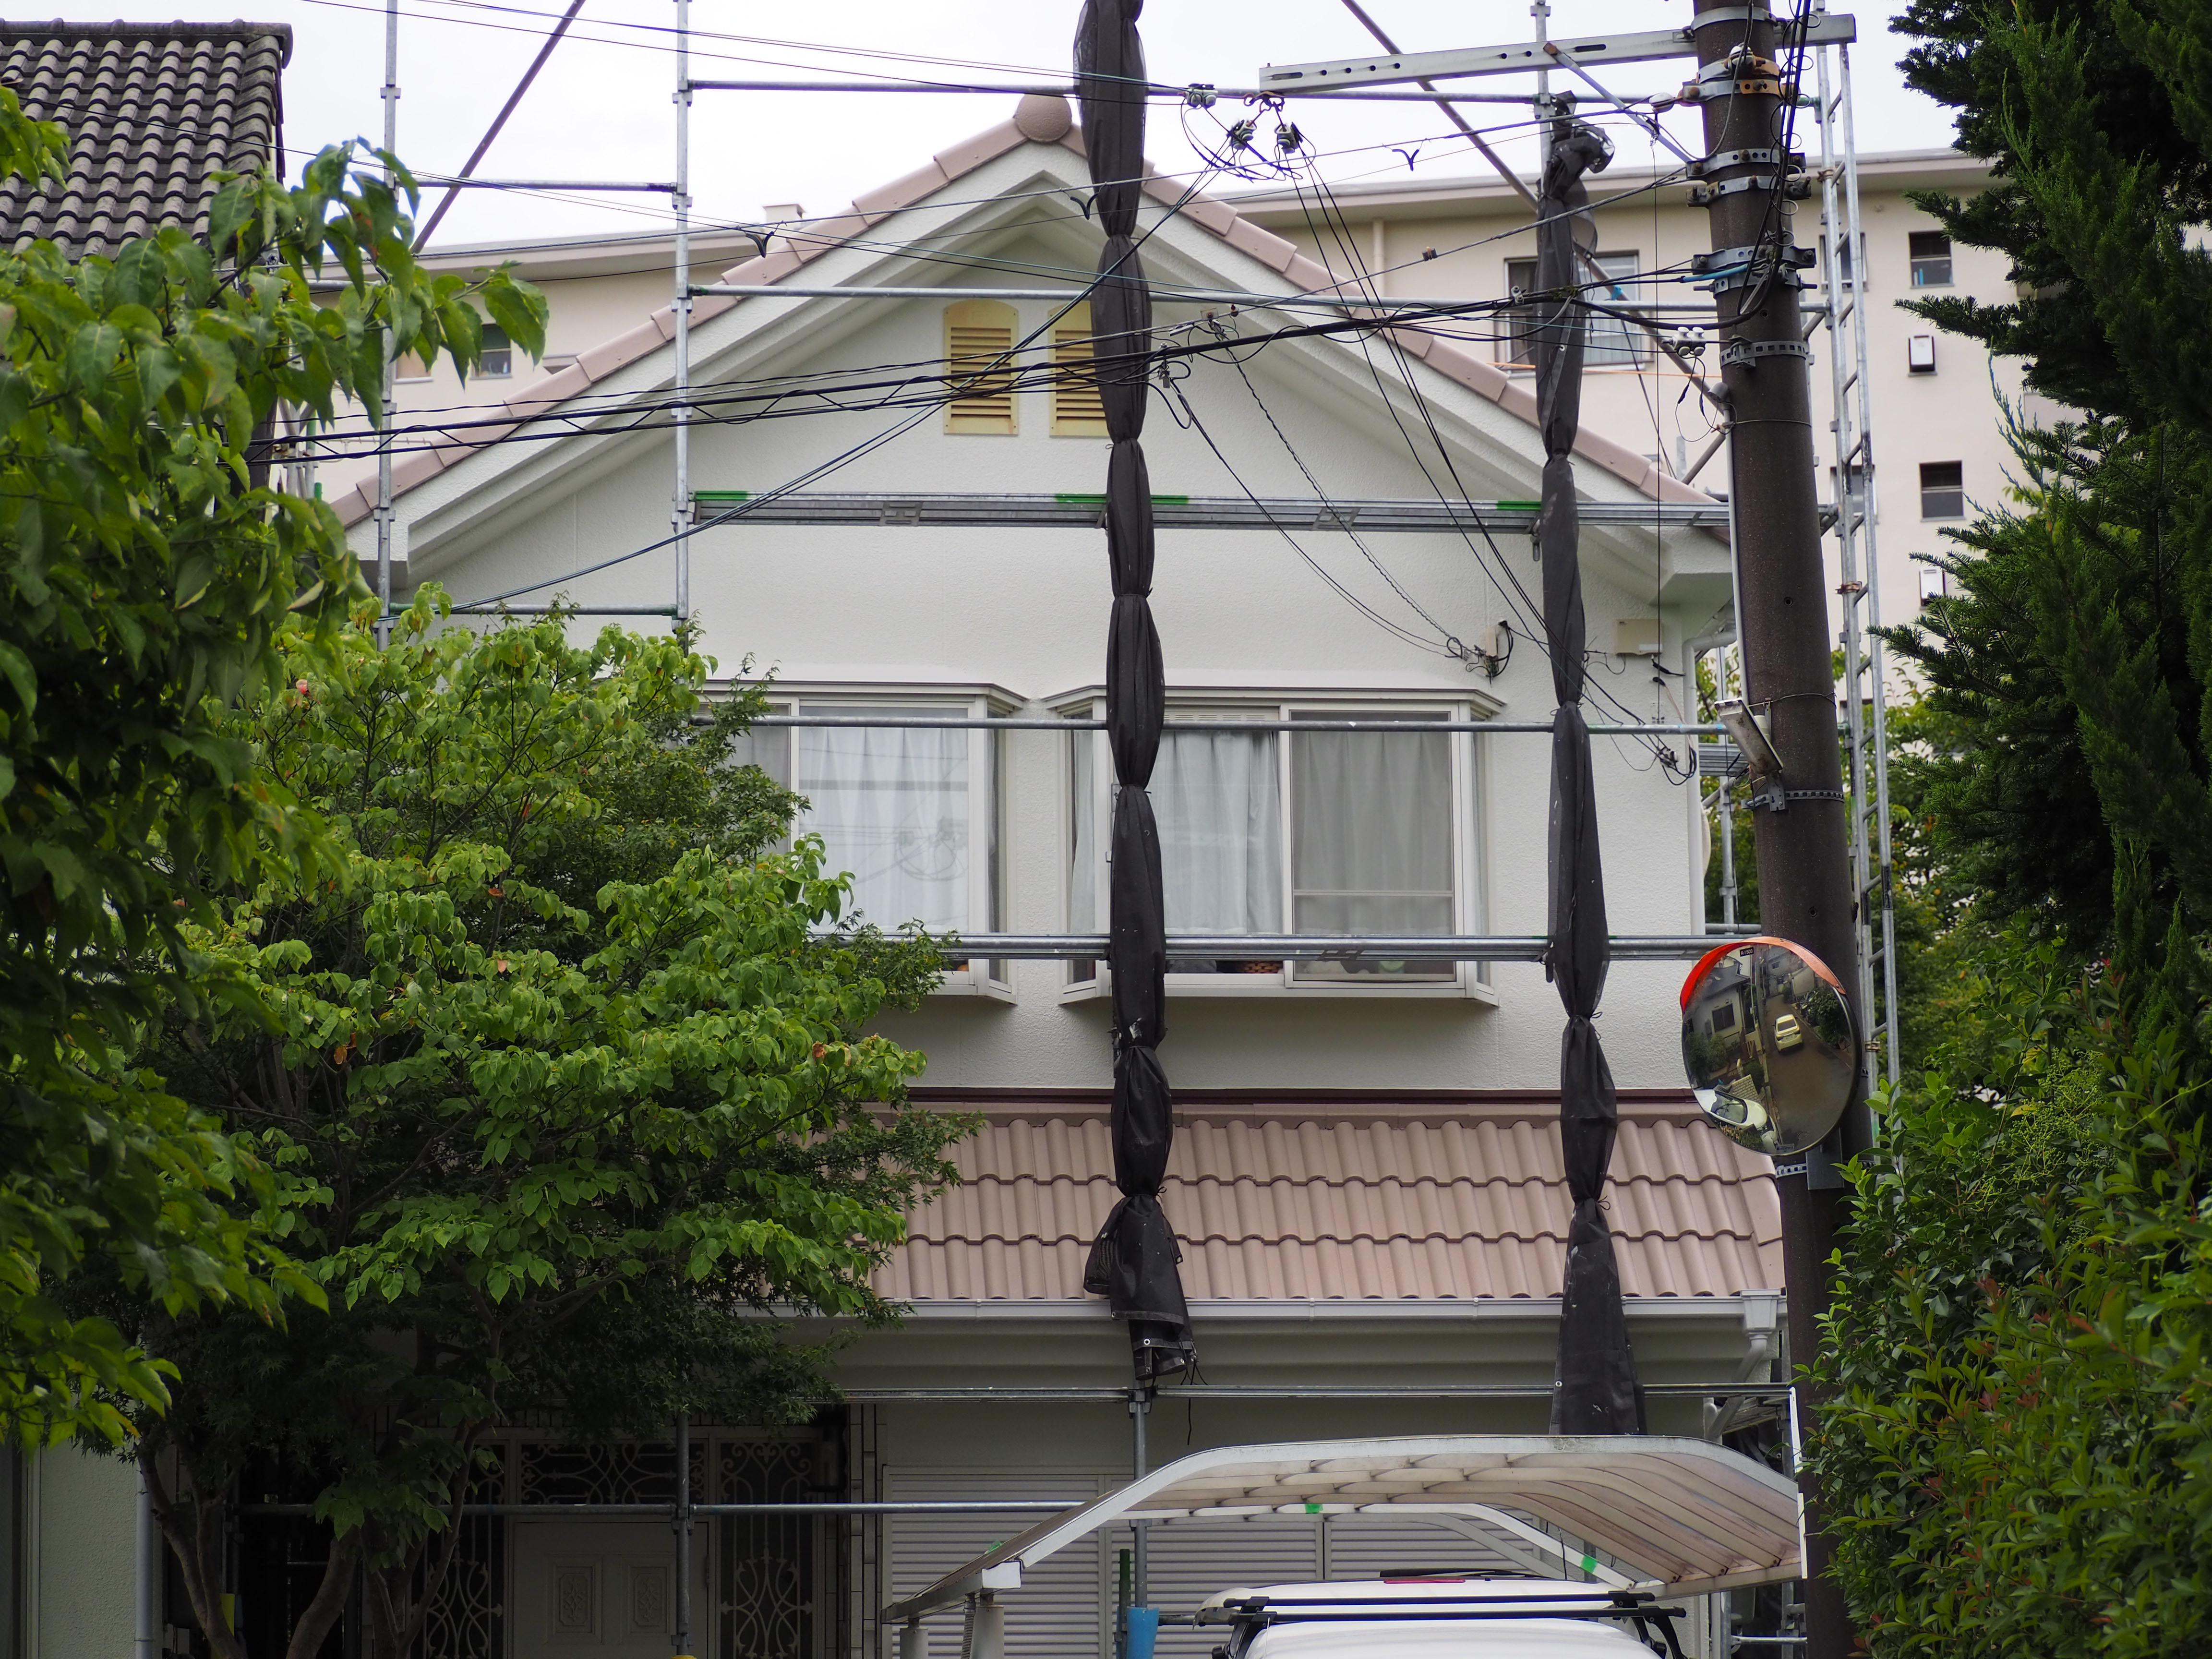 【GL034,GL030】大阪府H様邸 屋根・外壁遮熱塗装施工事例